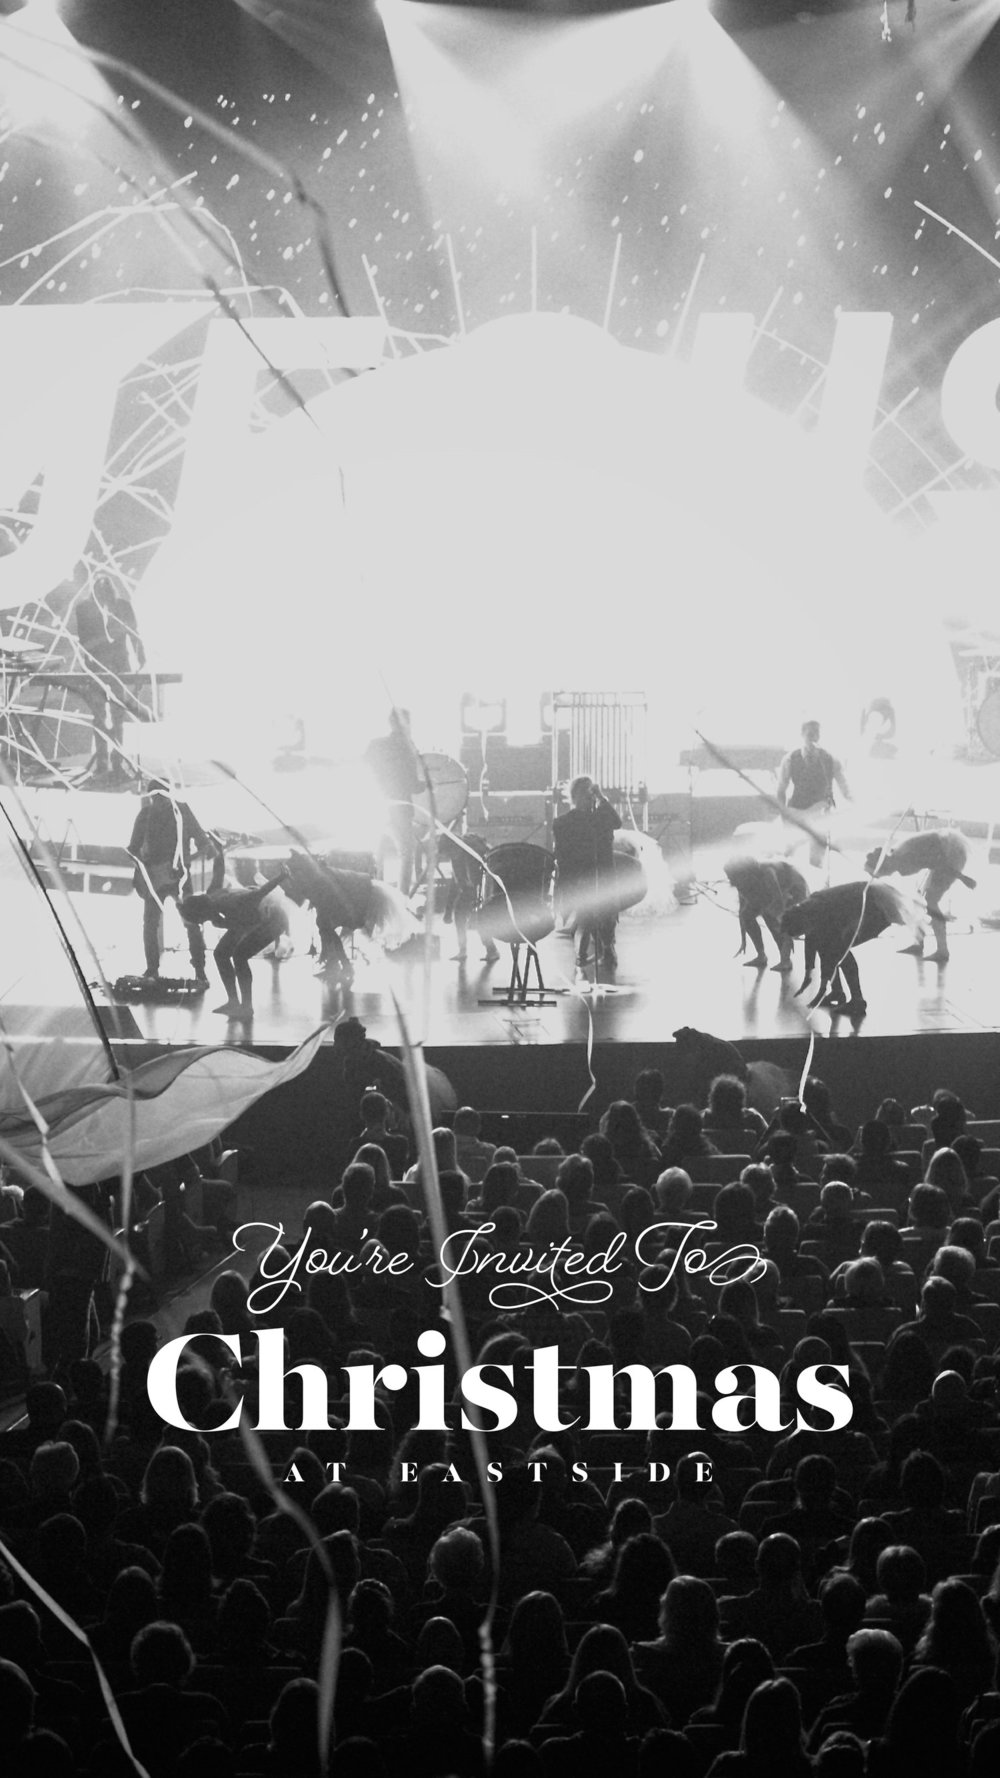 ChristmasAtEastsideInstaStory2.jpg